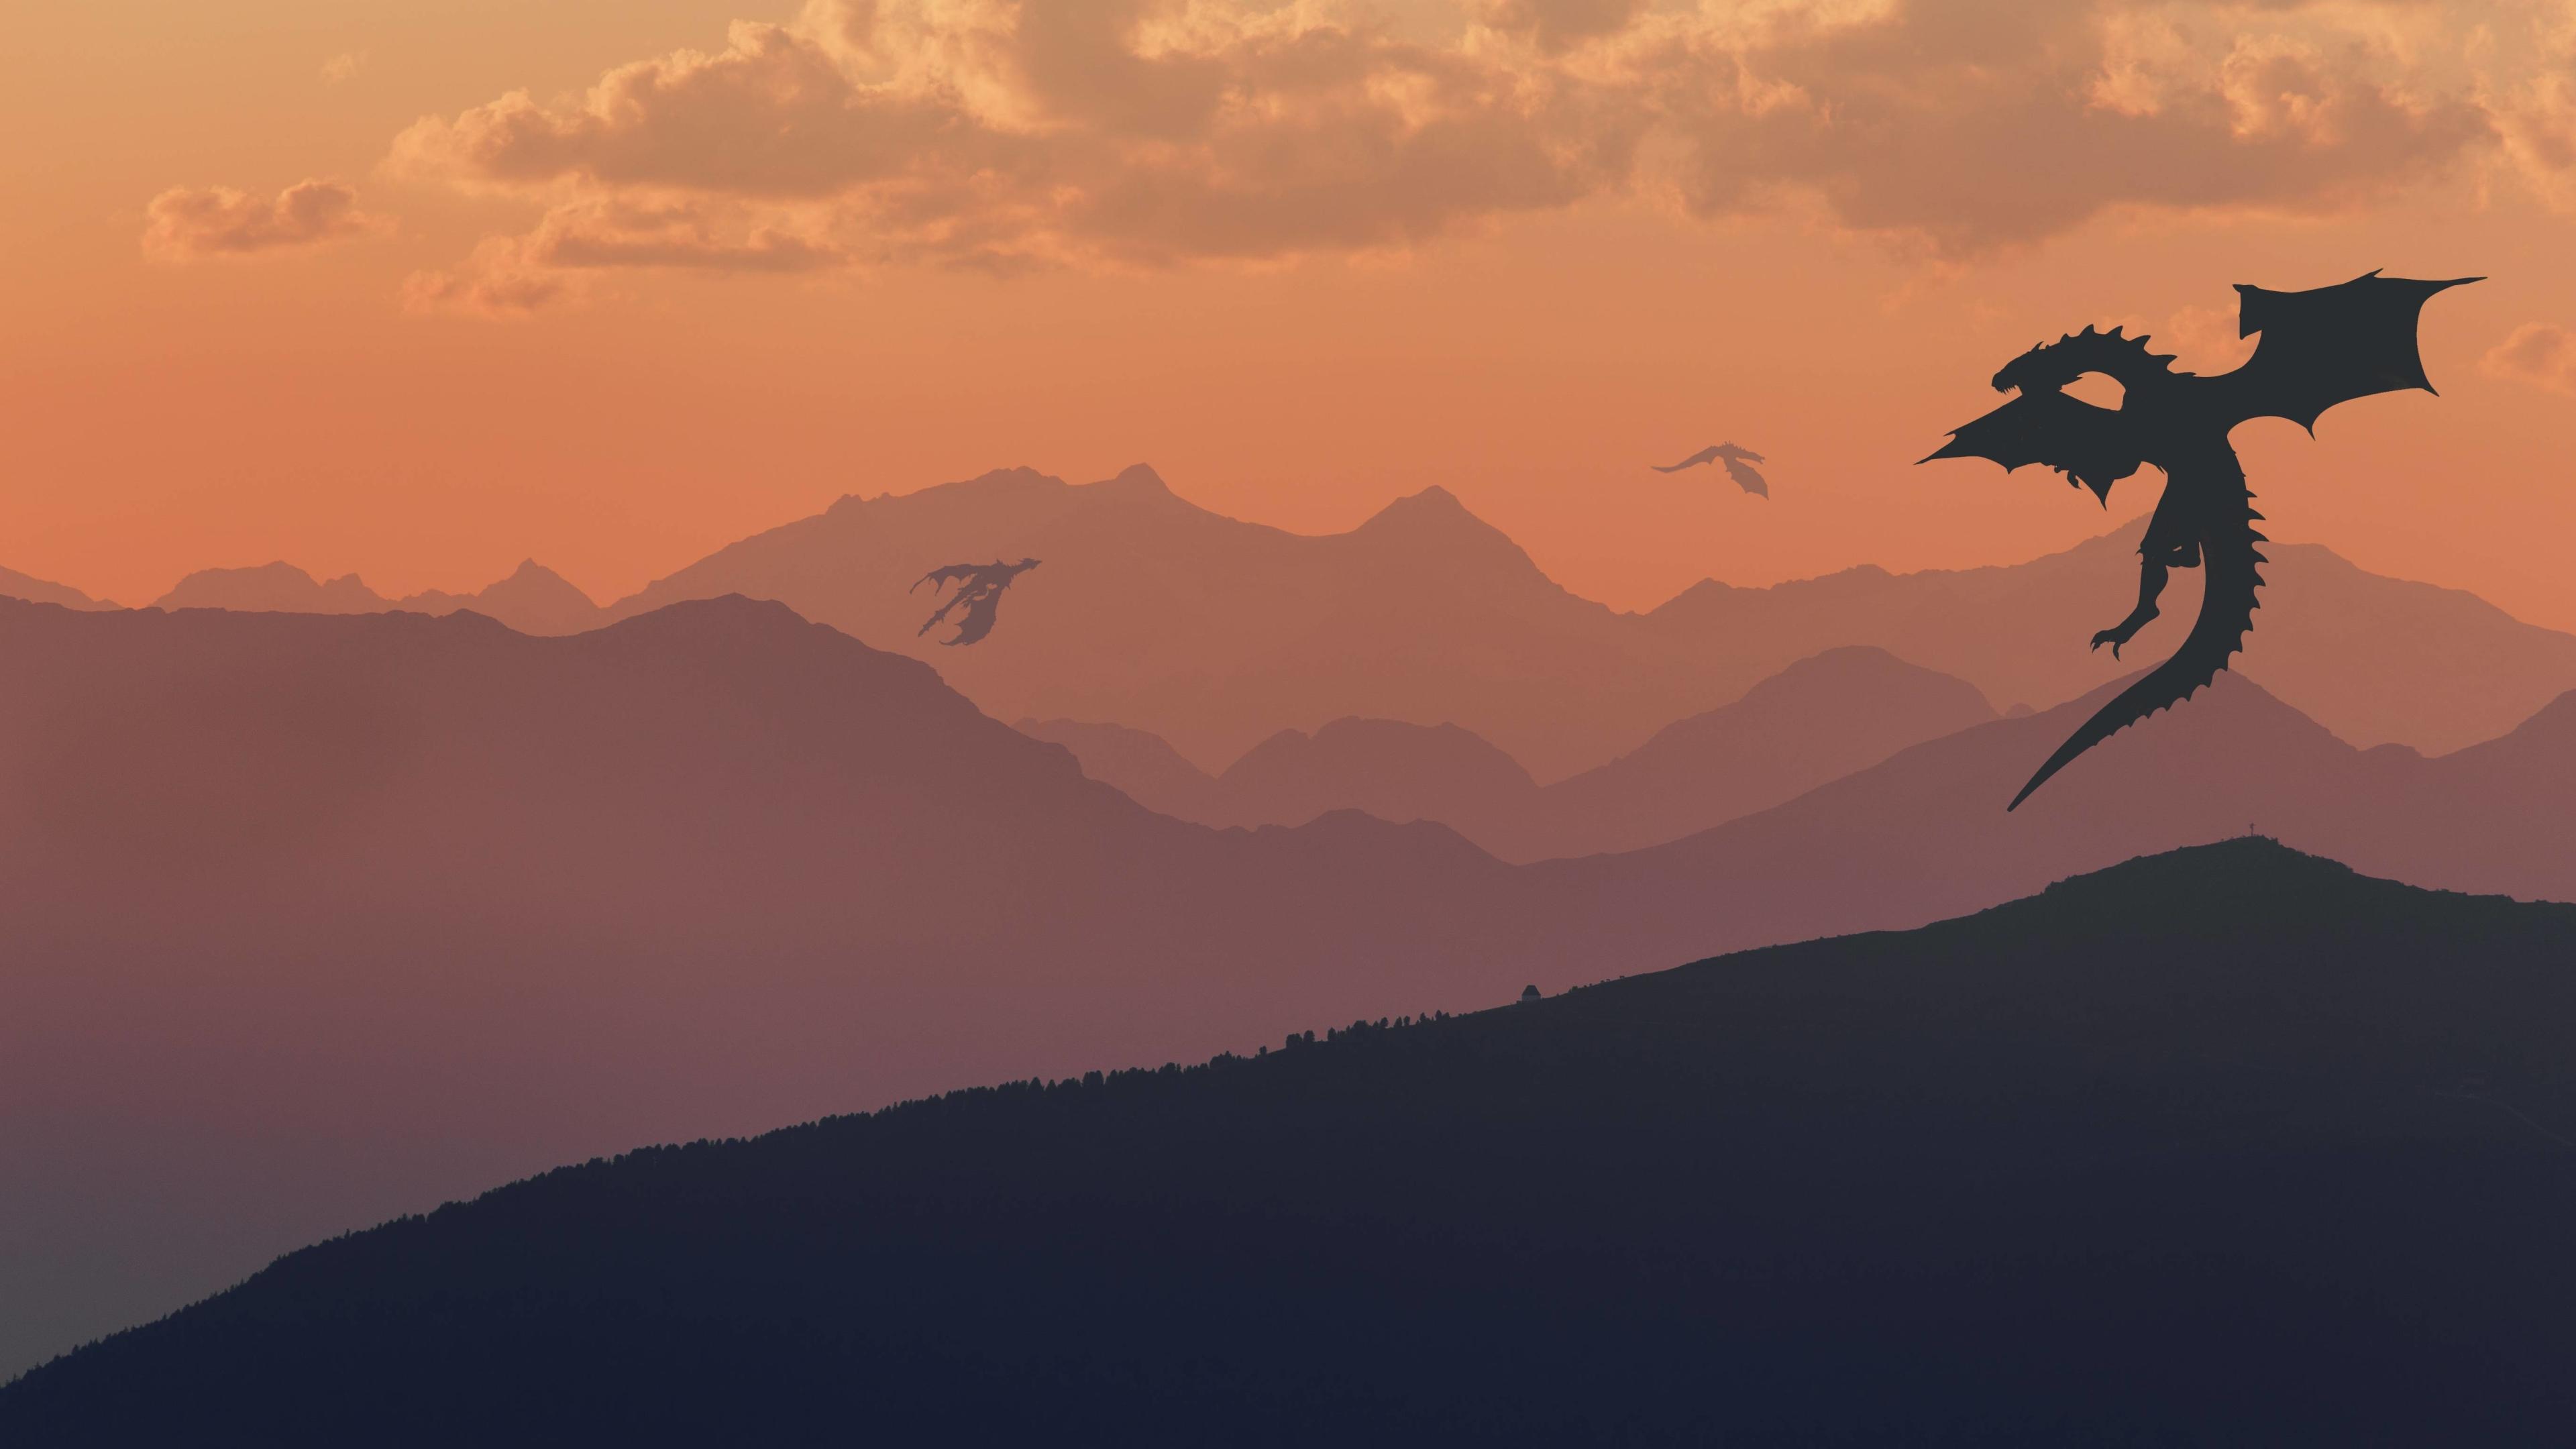 4k Game Of Thrones Wallpaper: Game Of Thrones Dragon Minimalist, HD 4K Wallpaper